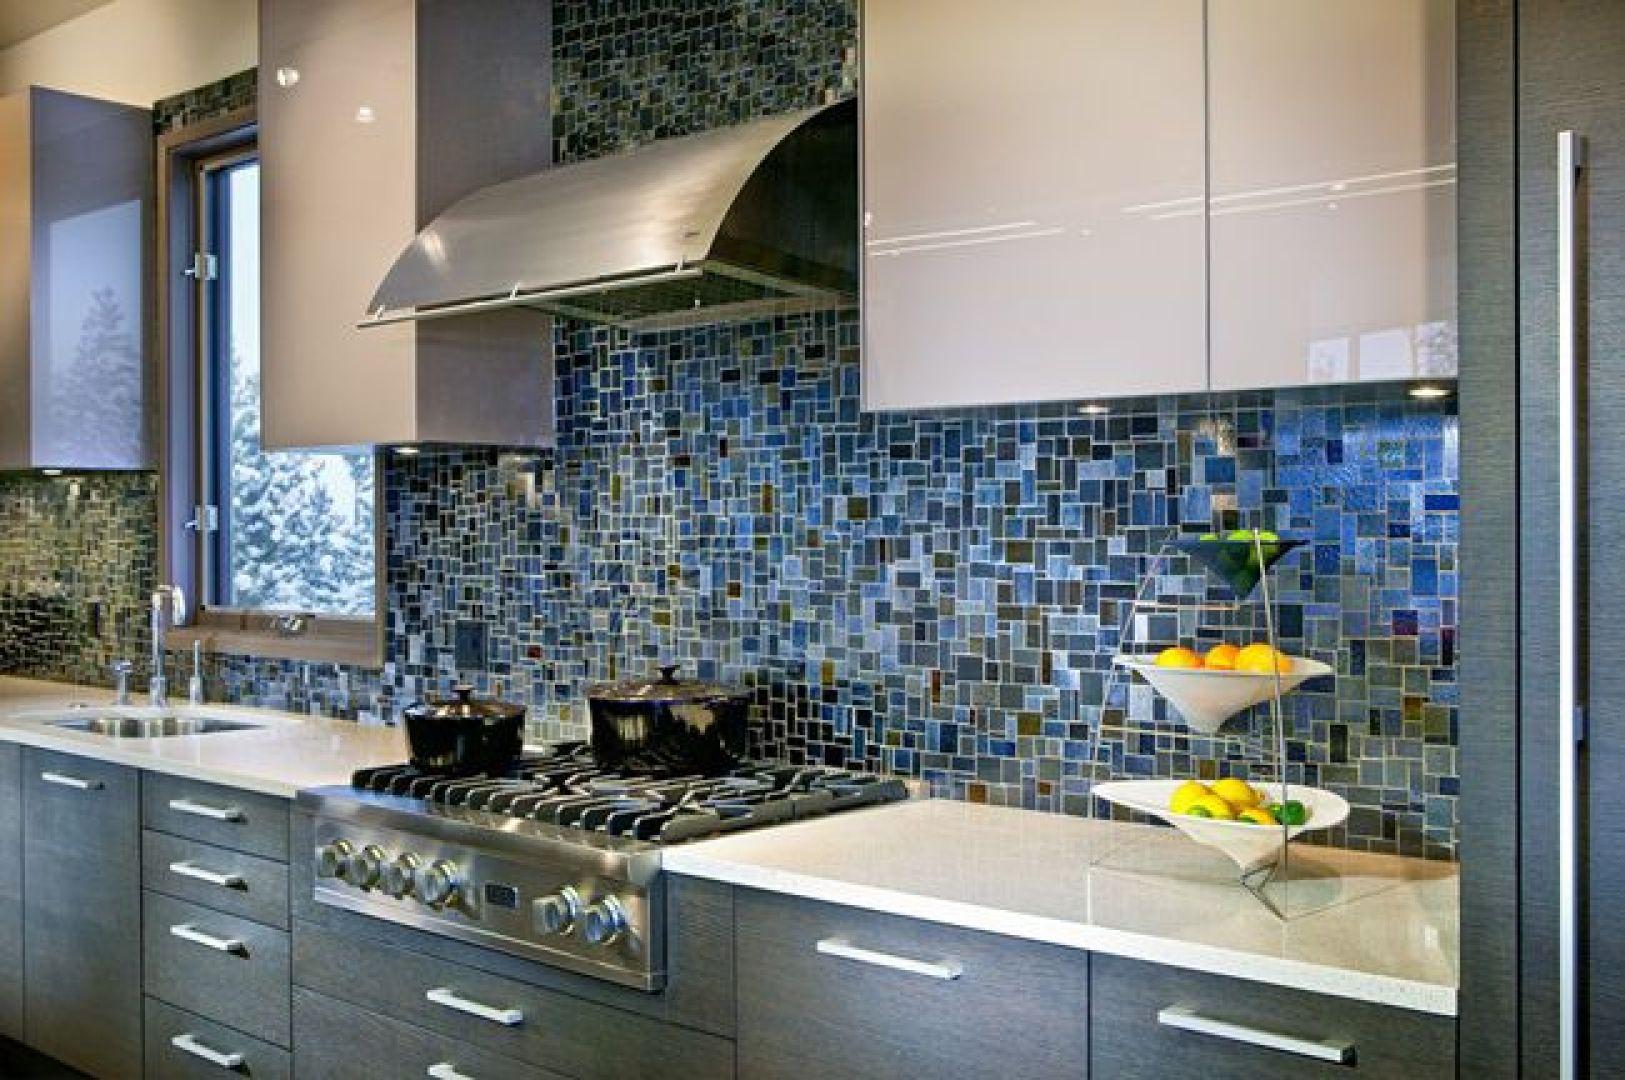 gạch ốp tường bếp - gạch mosaic